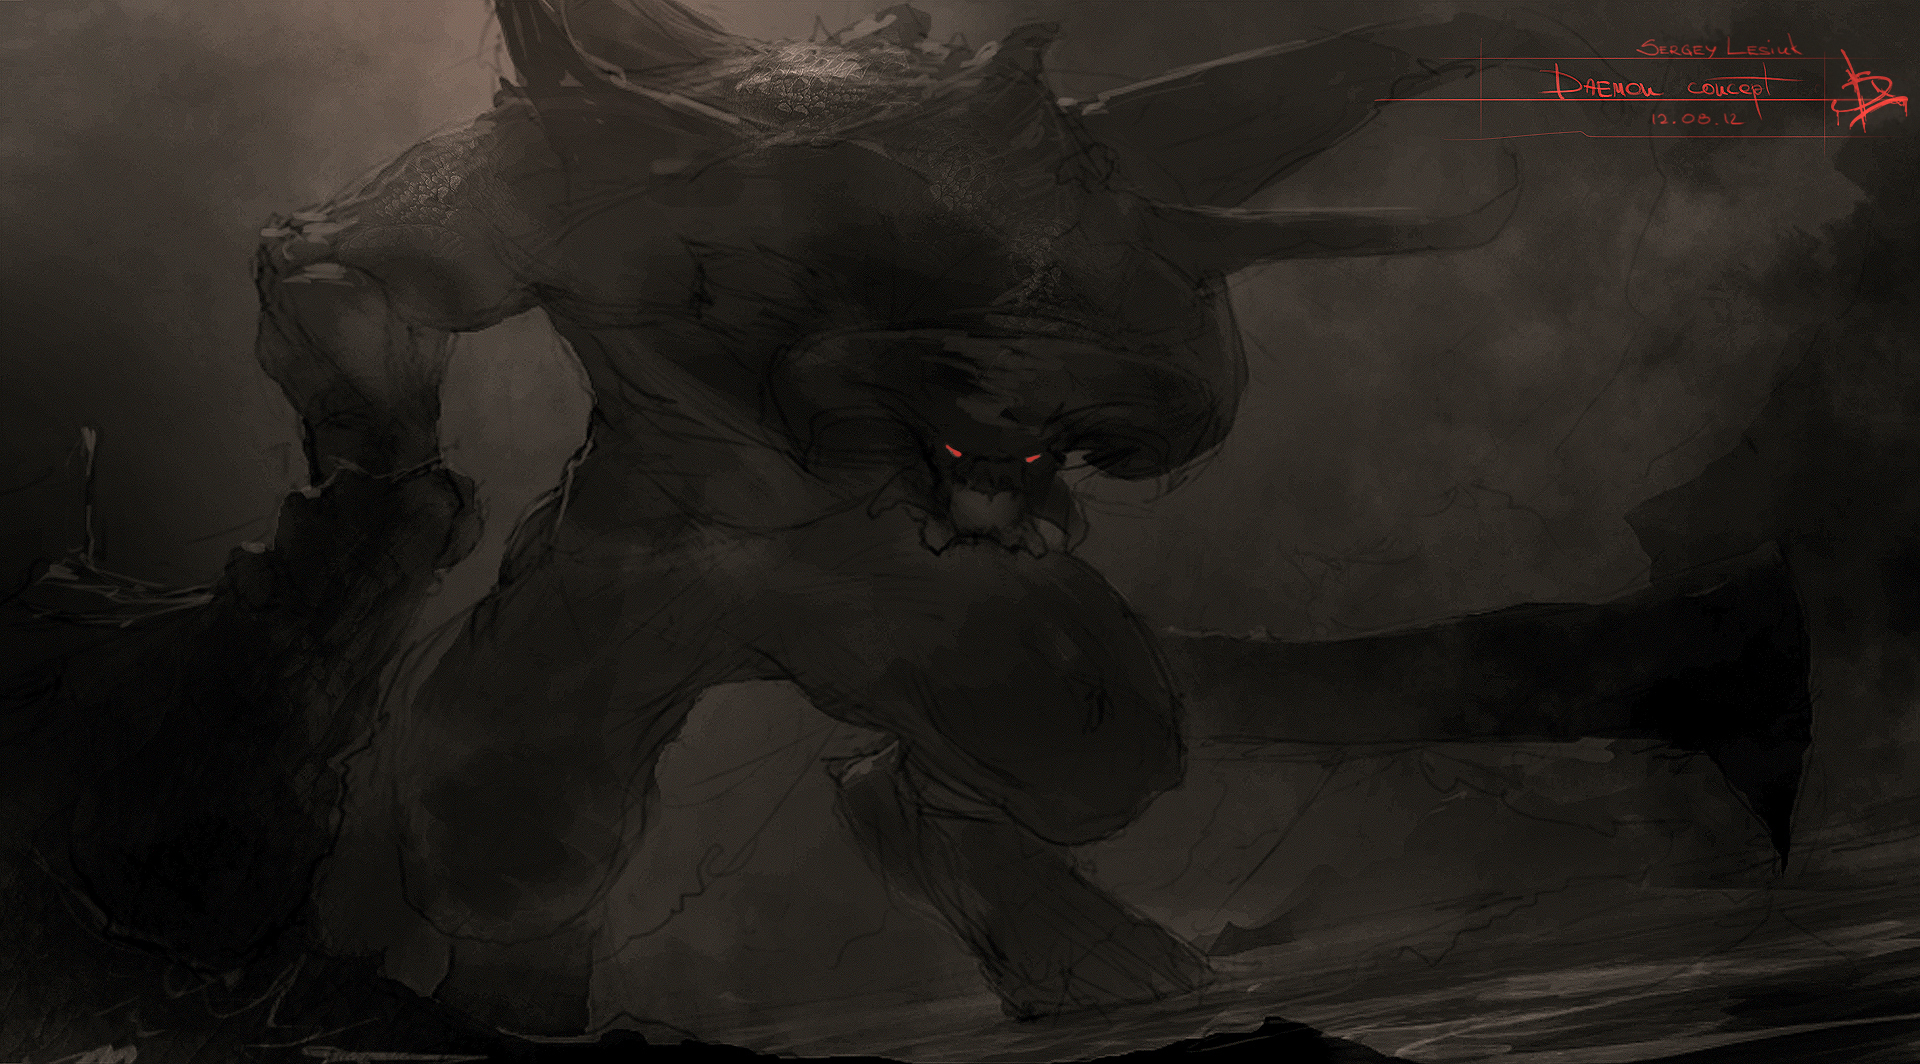 Daemon by Sergey-Lesiuk